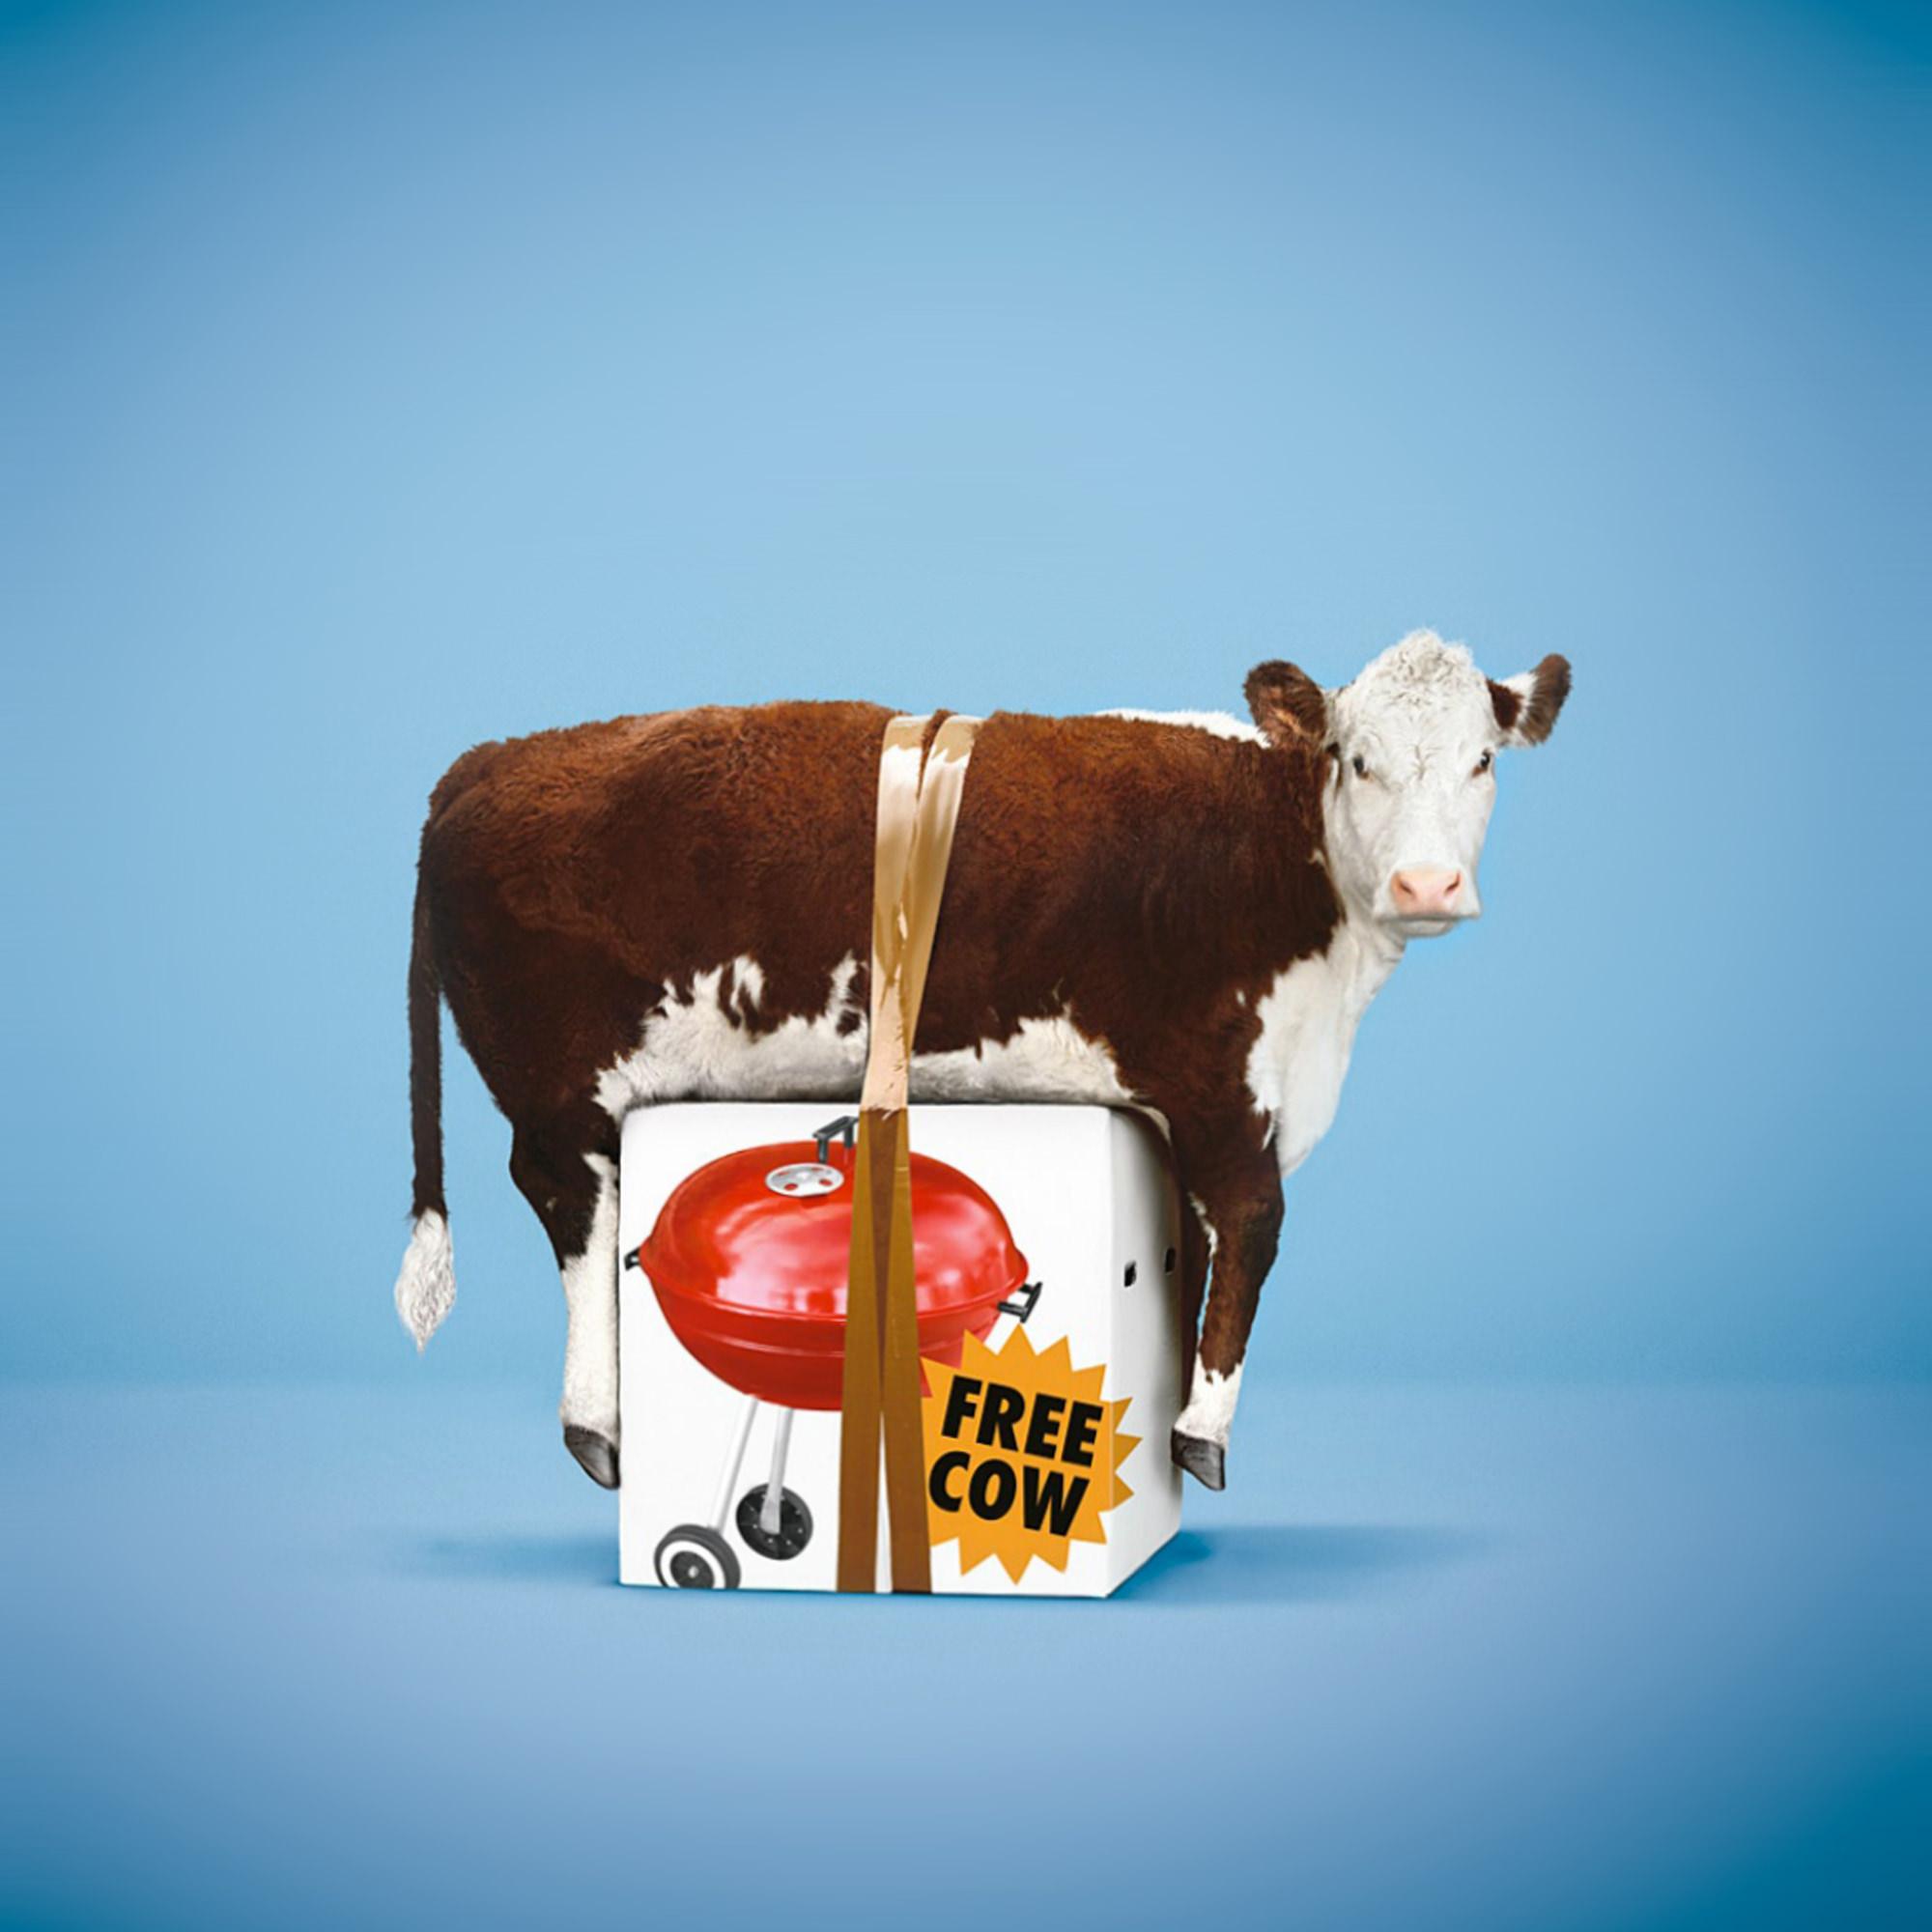 FREE-COW-STEPHEN-STEWART.jpg